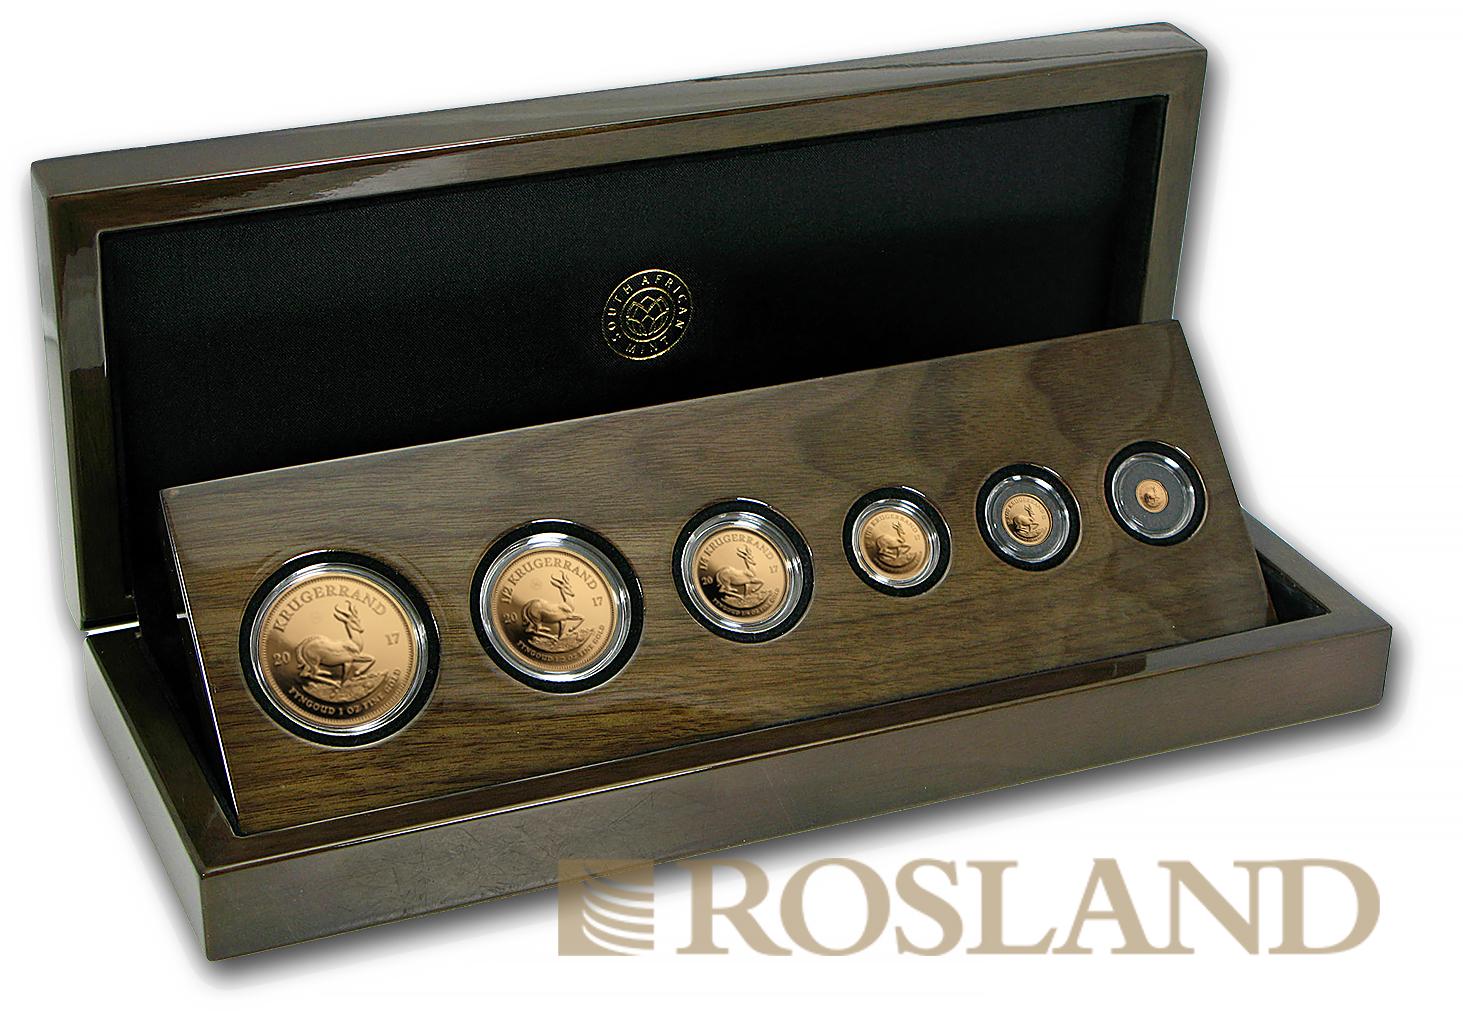 1,92 Unzen 6 Goldmünzen Krügerrand Prestige Set 2017 50 Jahre PP (Box, Zertifikat)